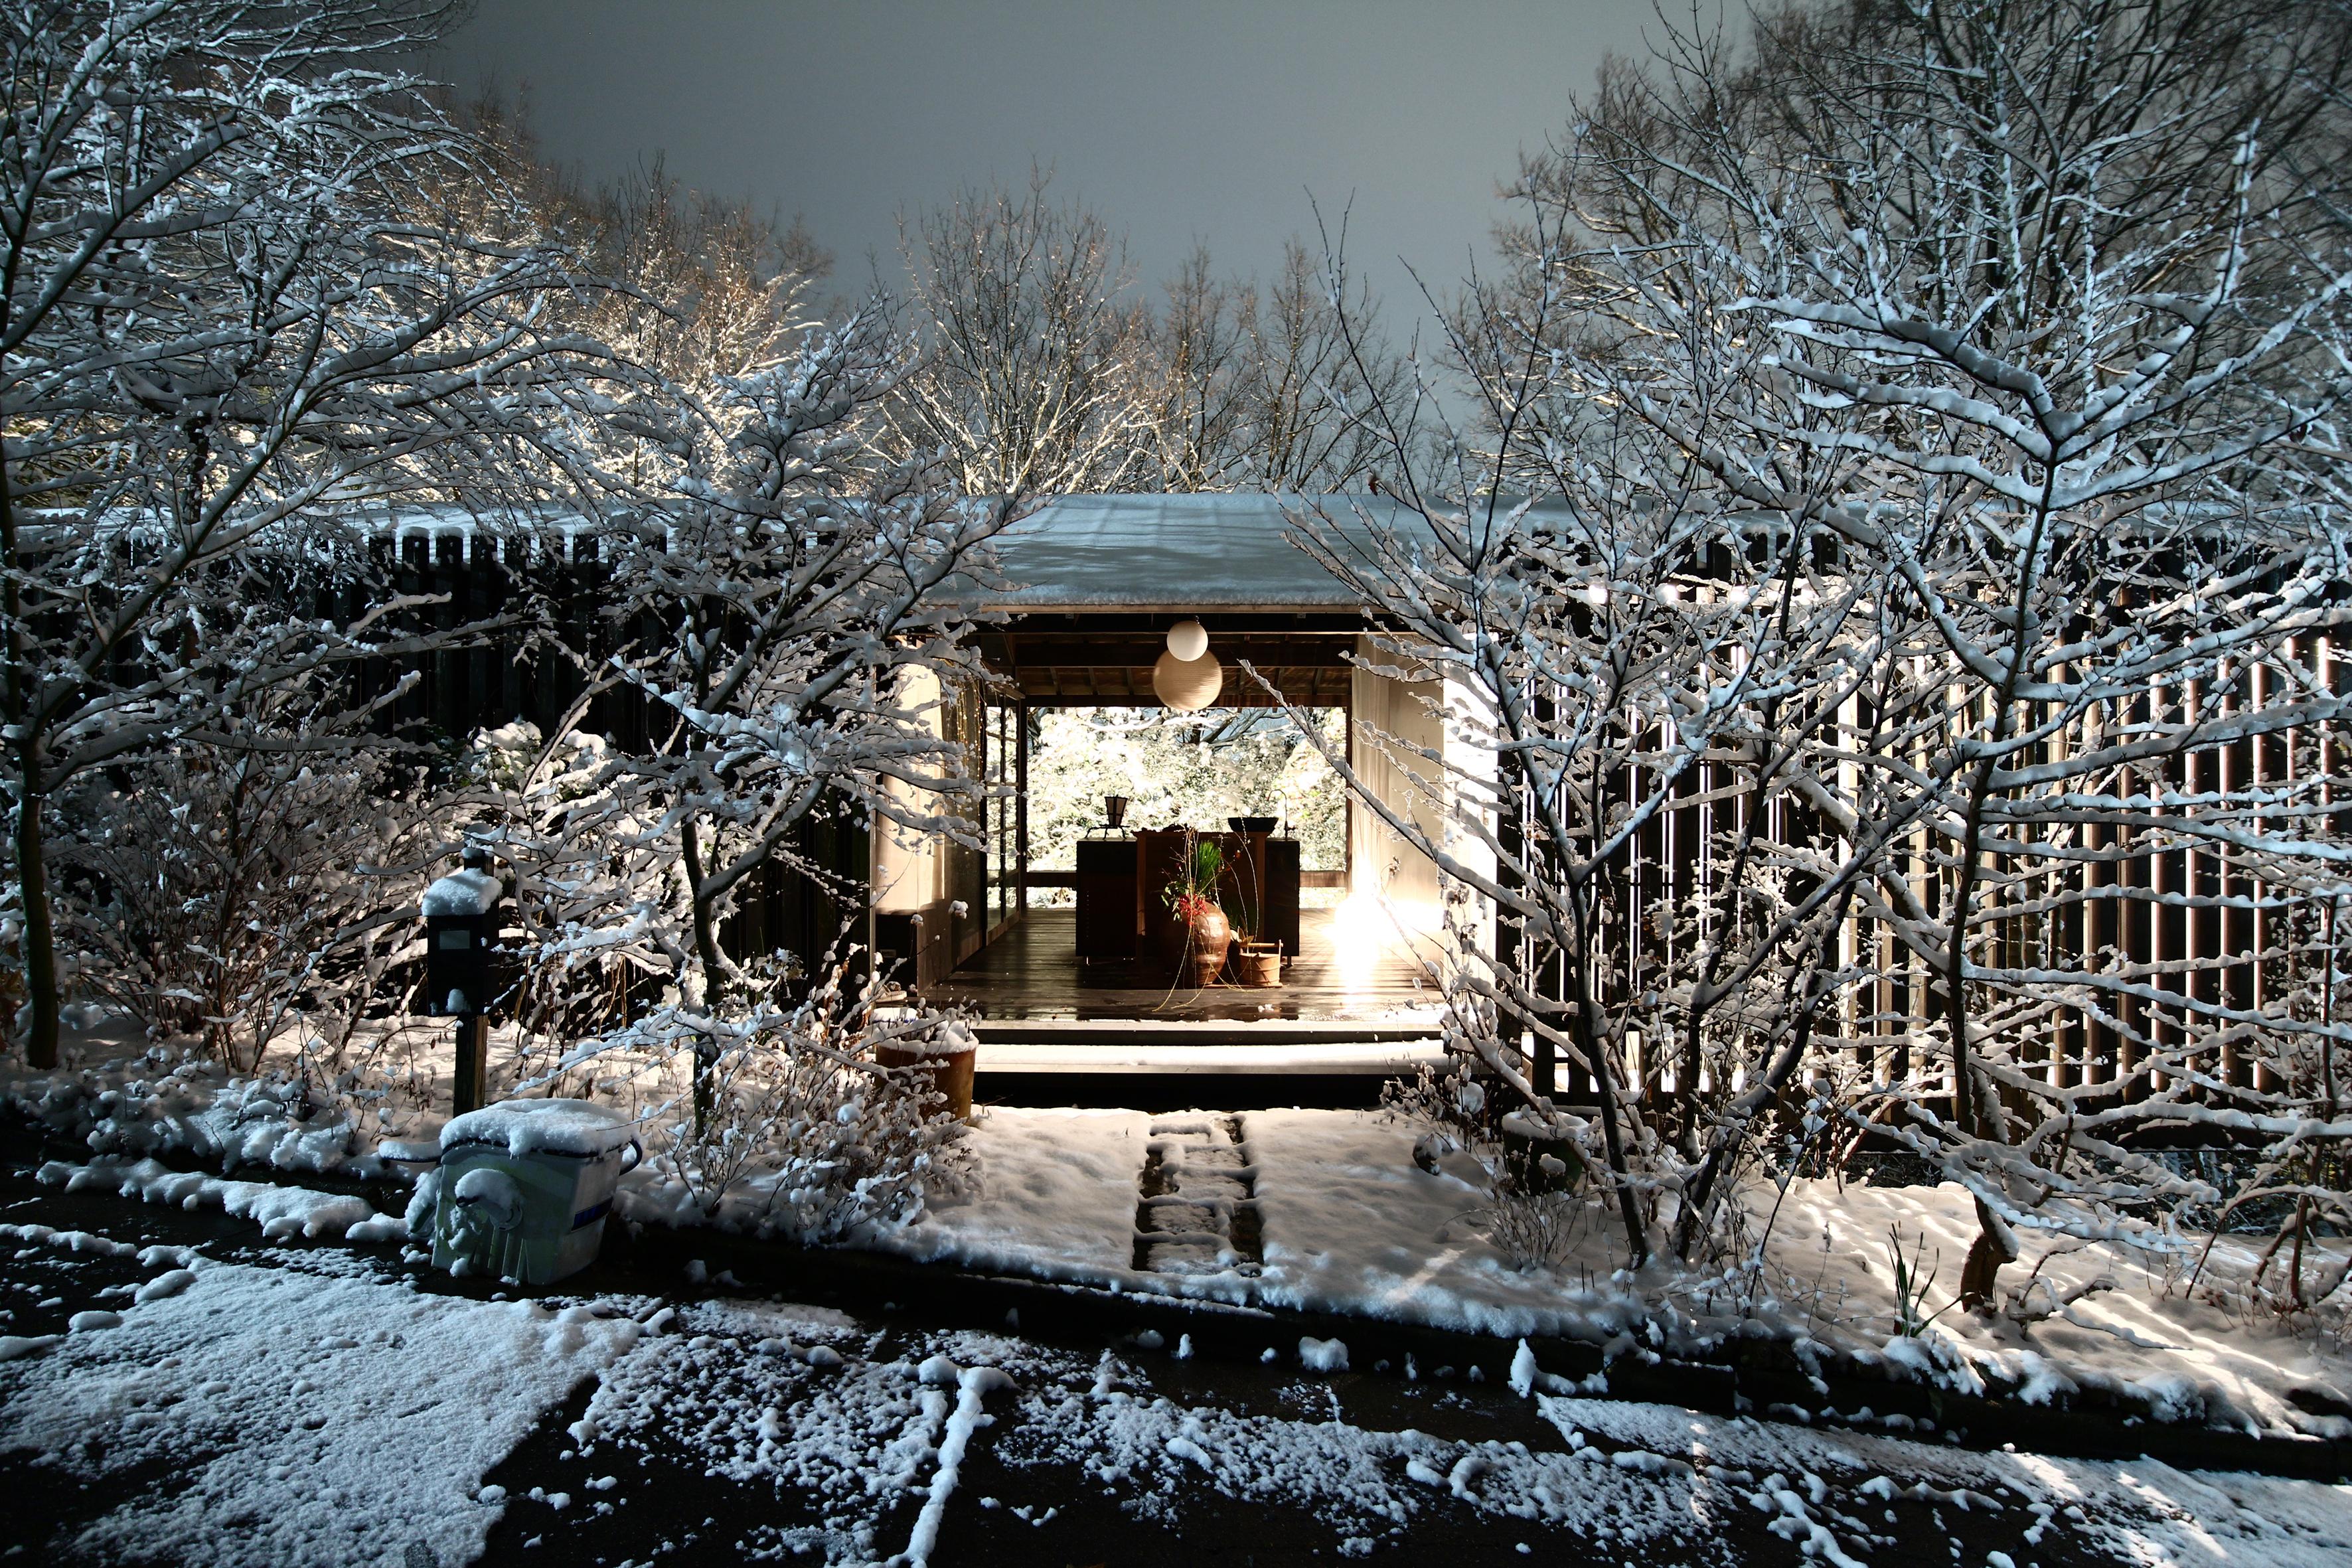 Snapshot(Snow scene)